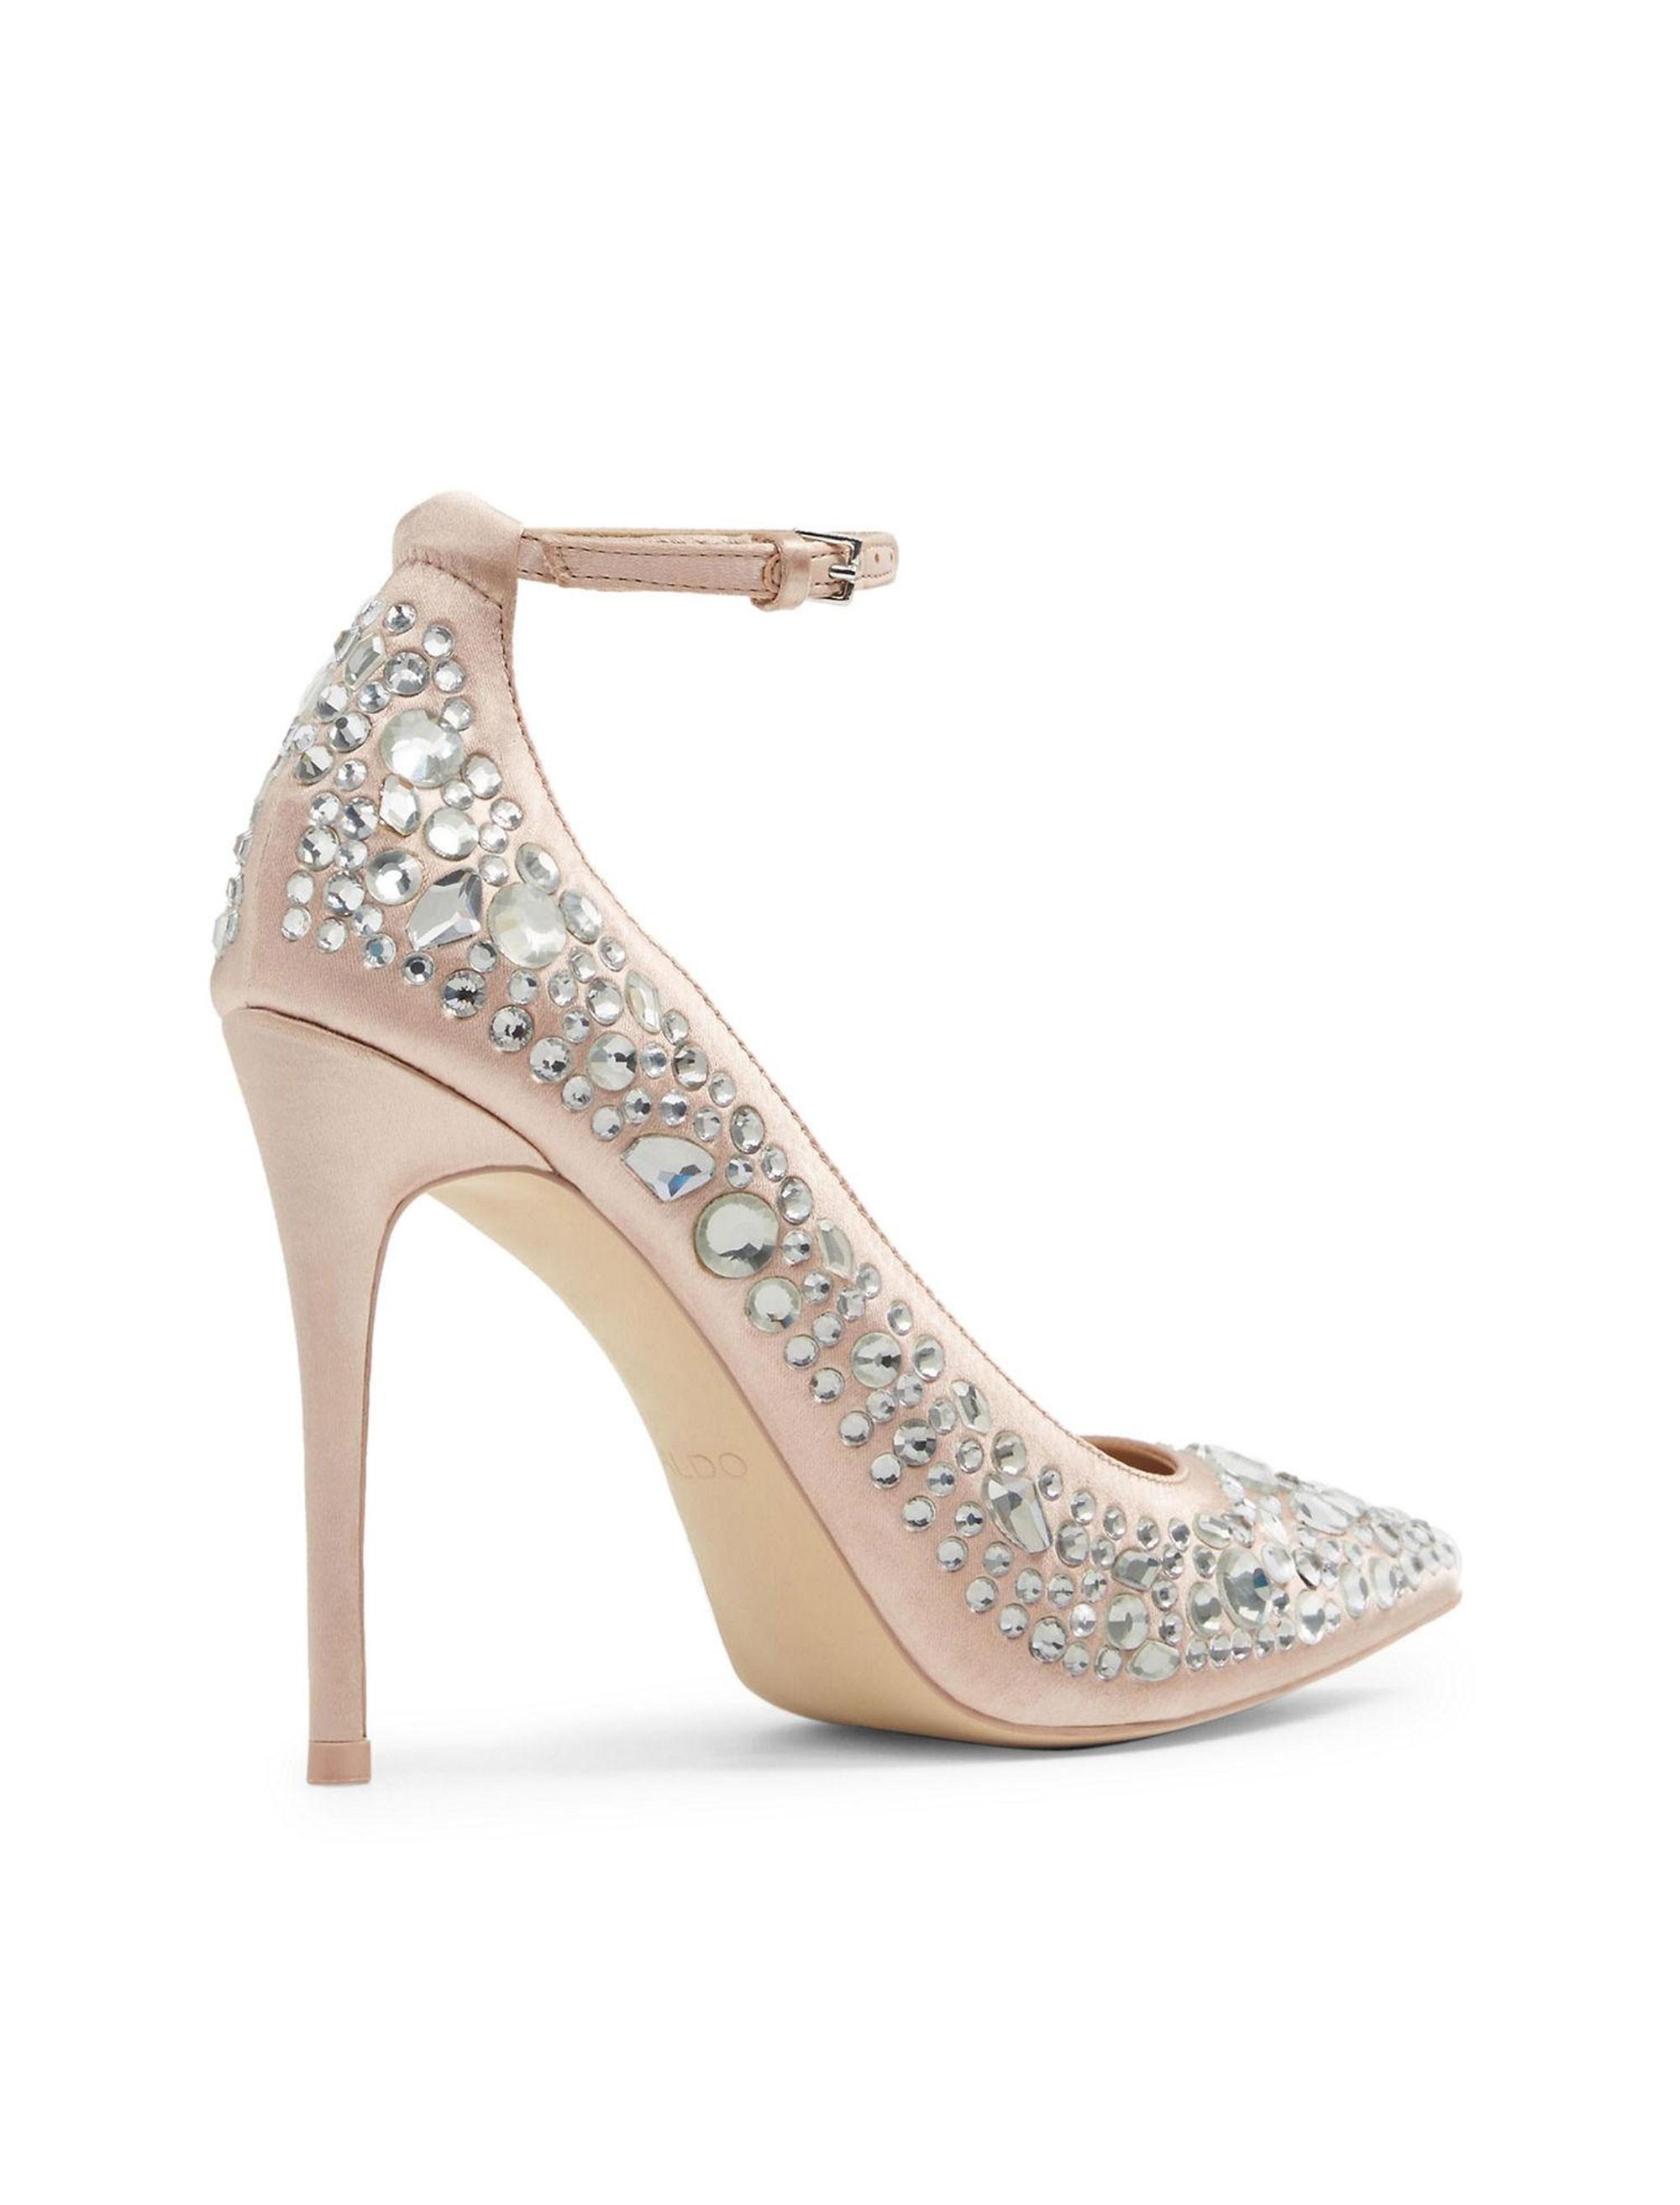 کفش پاشنه بلند پارچه ای زنانه - آلدو - صورتي روشن - 4